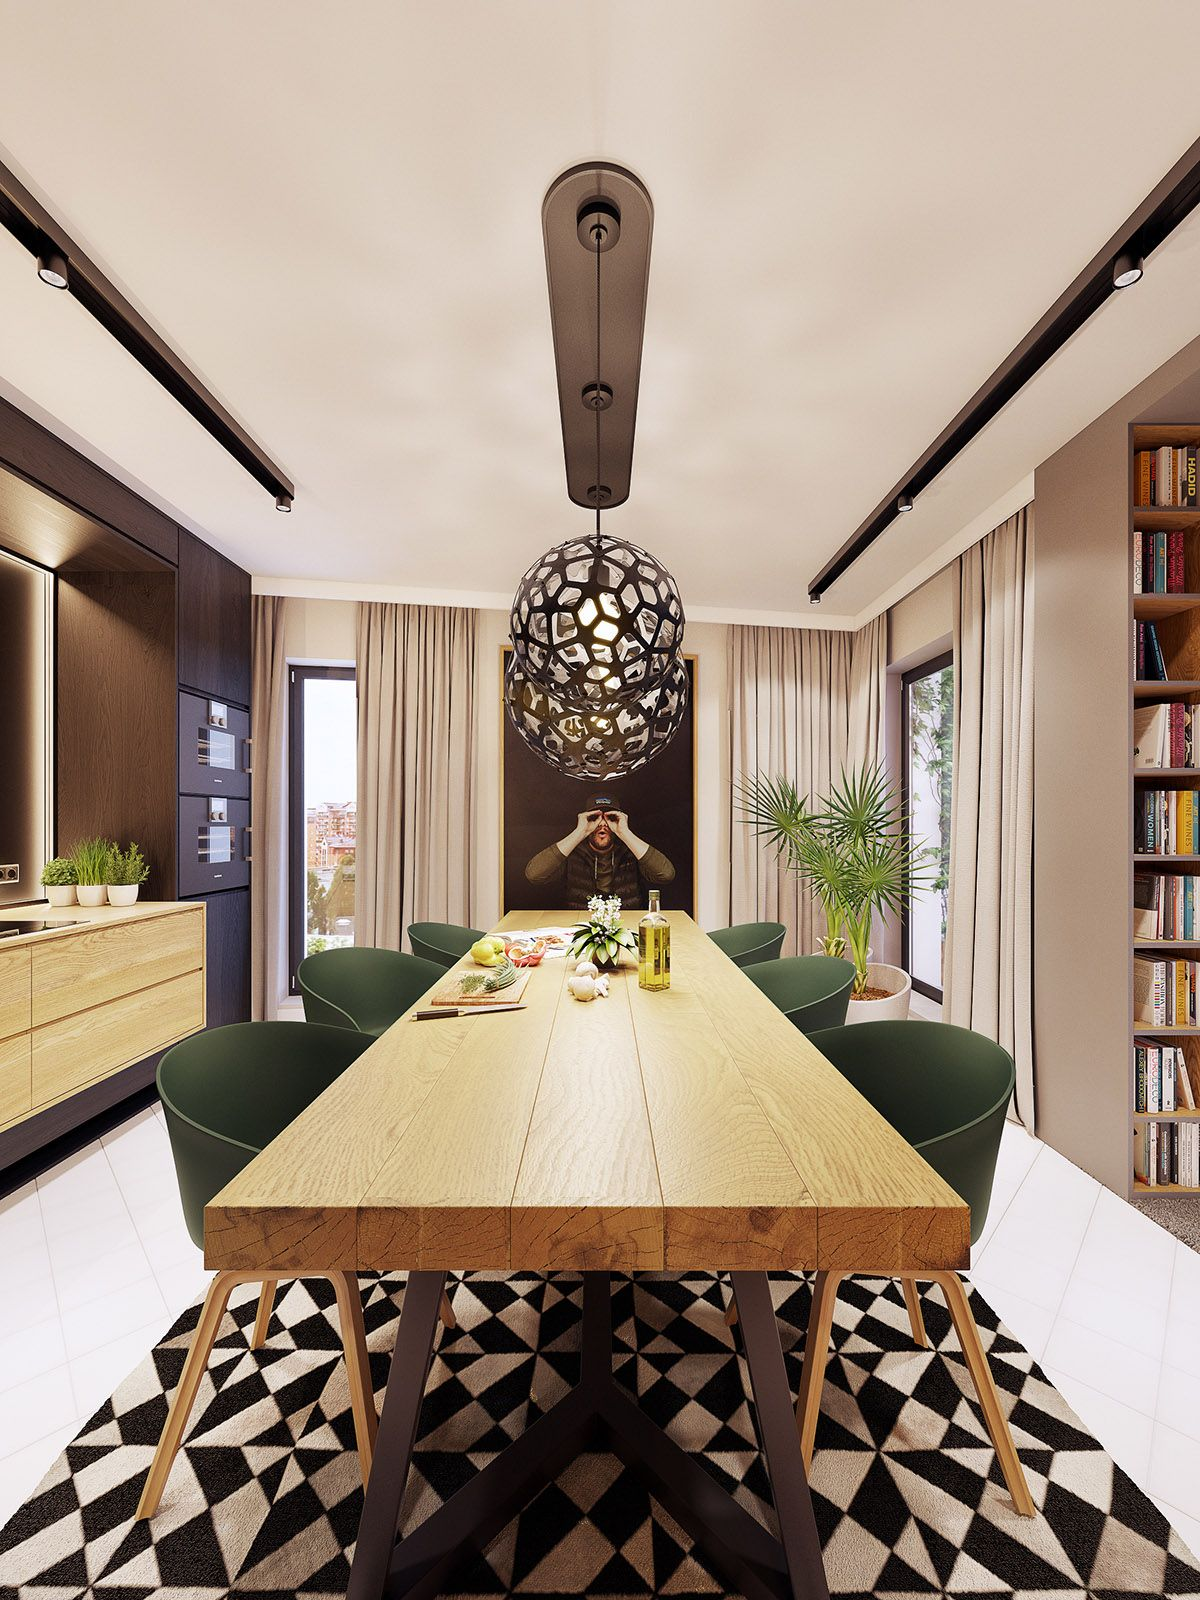 Feature Rich Decor In Family Friendly Apartment Home Decor Ideas